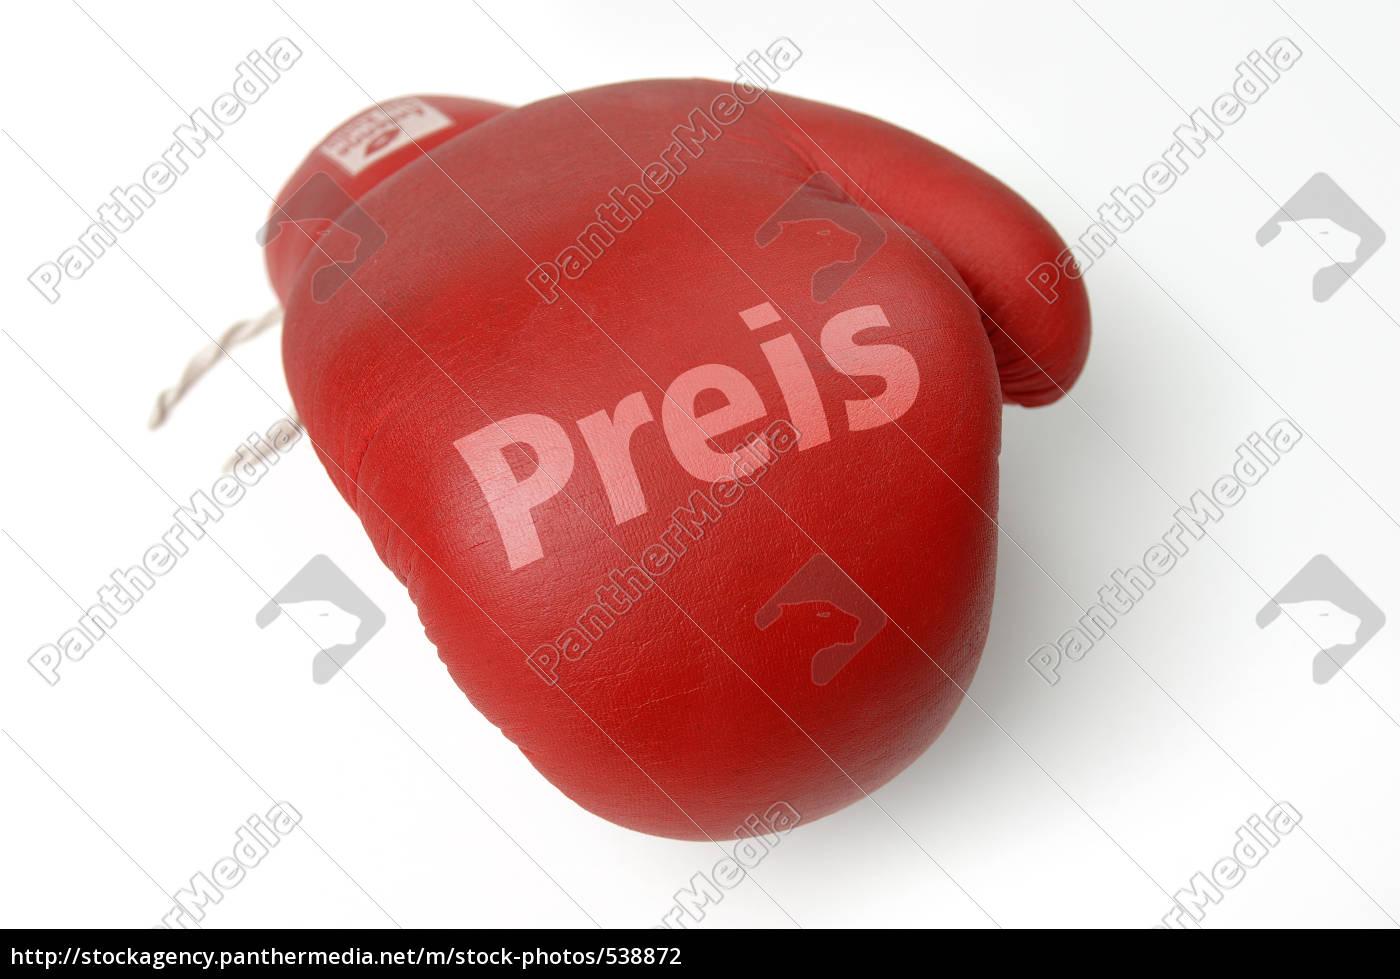 red, boxing, glove, imprint, price - 538872